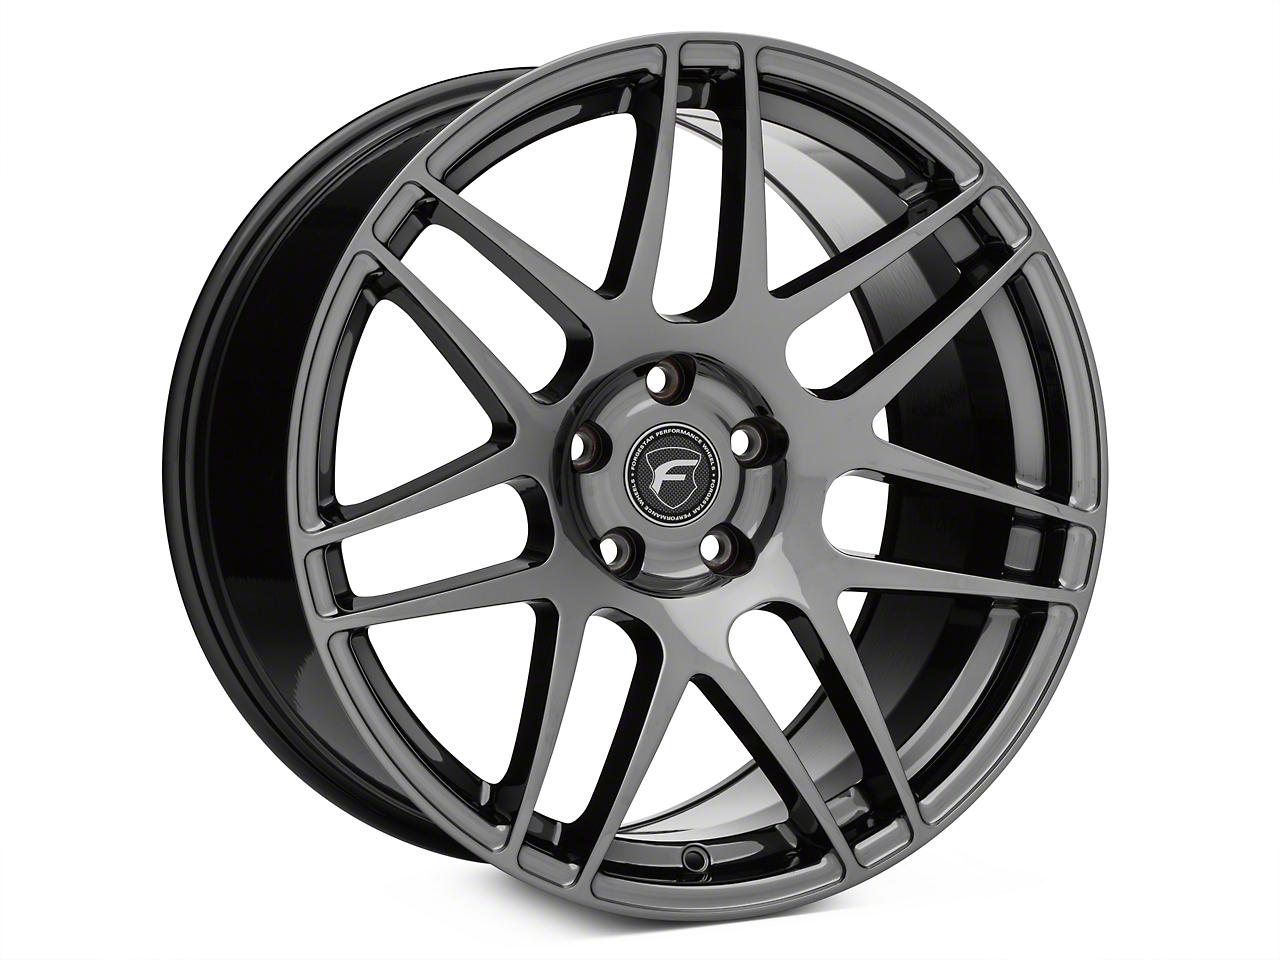 Forgestar F14 Monoblock Black Nickel Wheel - 19x10 (15-17 All)